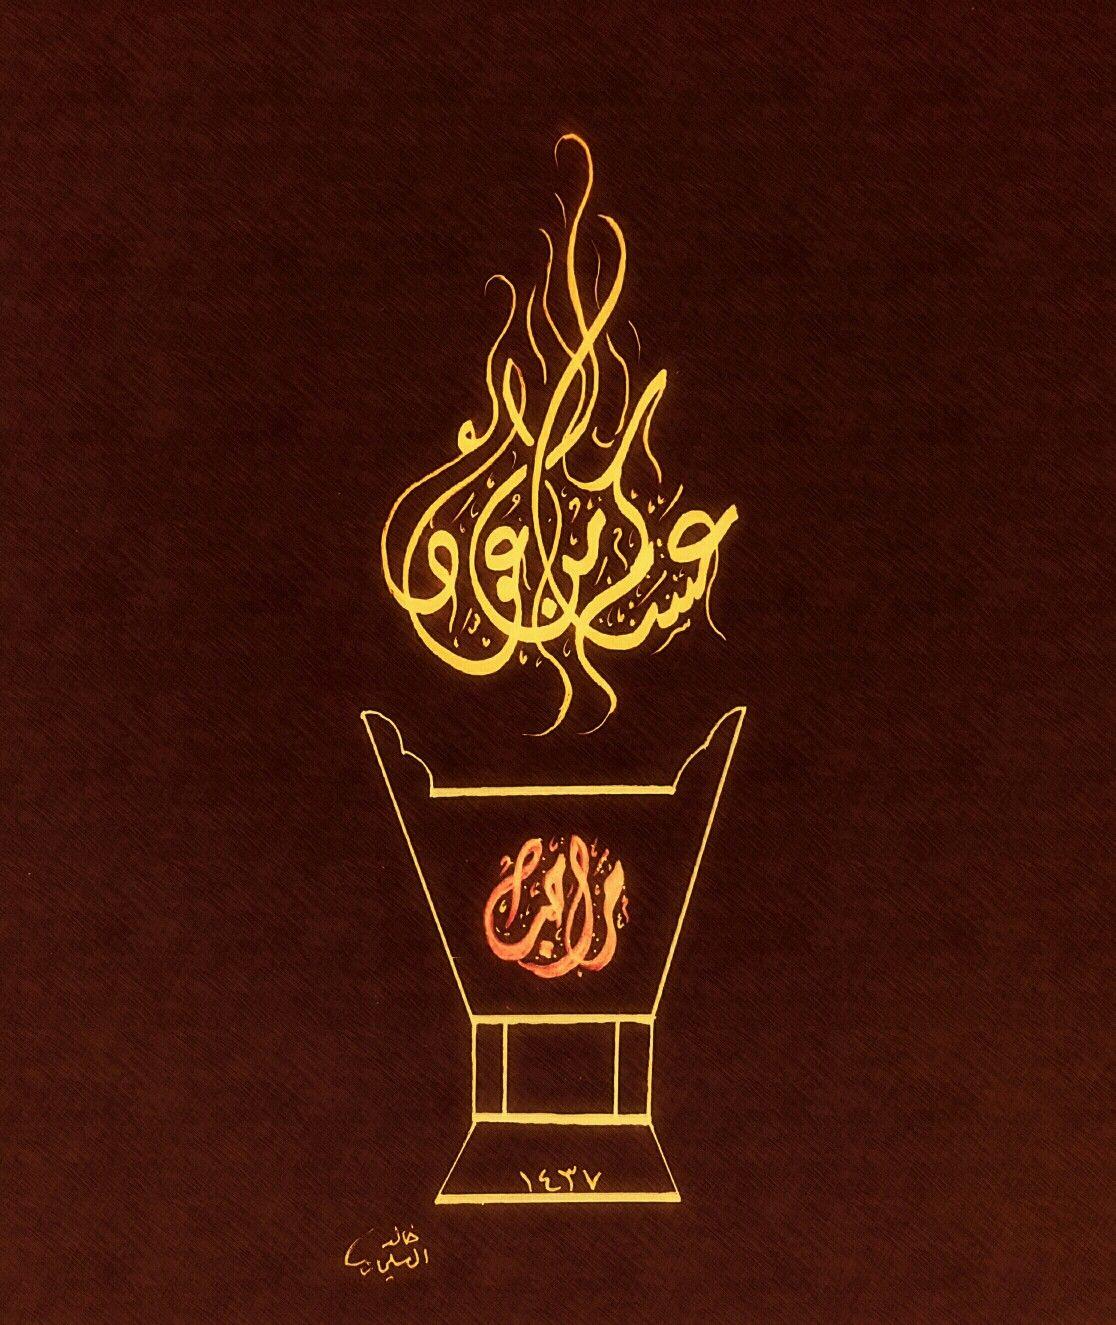 عساكم من عواده مراحب Eid Cards Muslim Celebrations Islamic Art Calligraphy